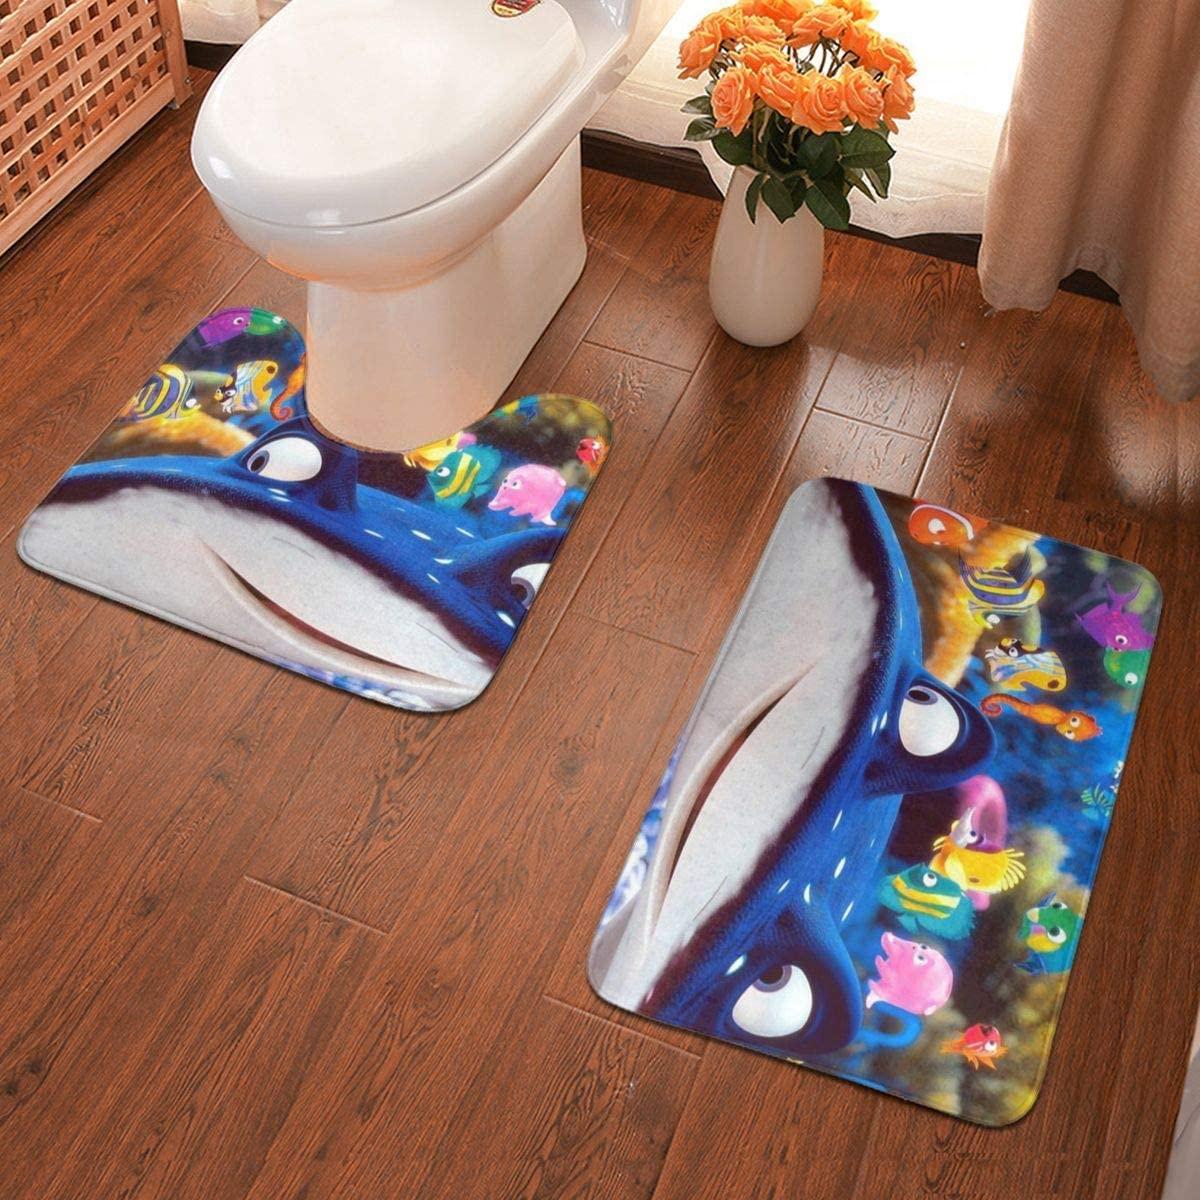 Boweike Finding Nemo Bathroom Antiskid Pad Non-Slip Bath Carpet Floor Mat Rug 2 Sets -Floor Mat+U-Shaped Pad, Toilet Washable Blanket Mats for Bathroom Home Shower